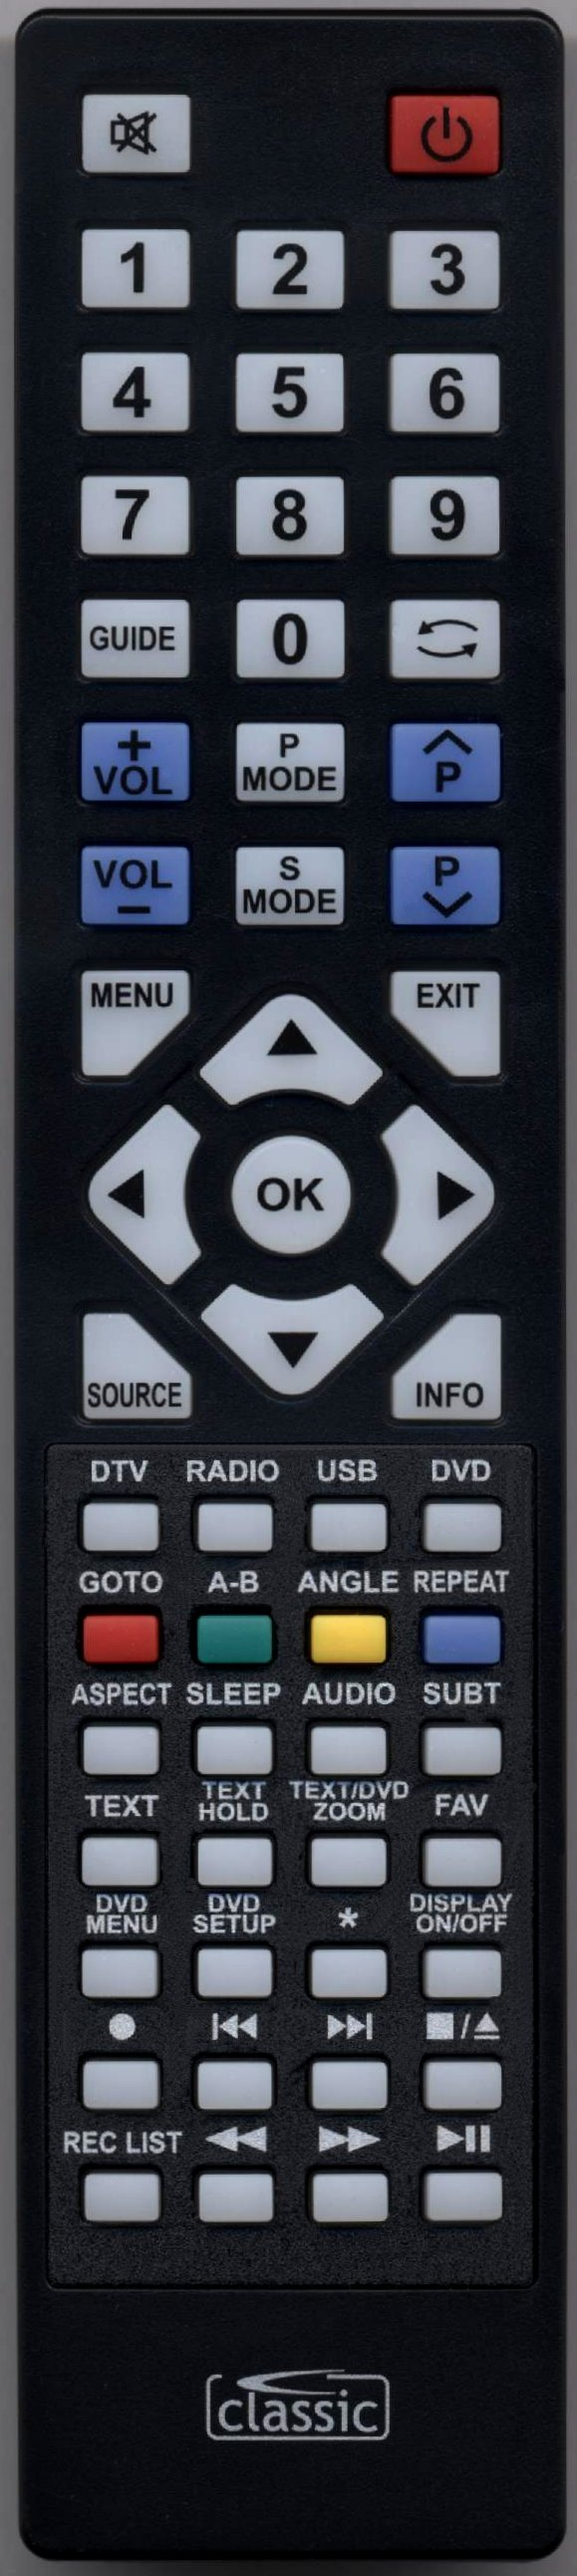 BLAUPUNKT 40/148Z-GB-11B-FGKU-UK Remote Control Alternative